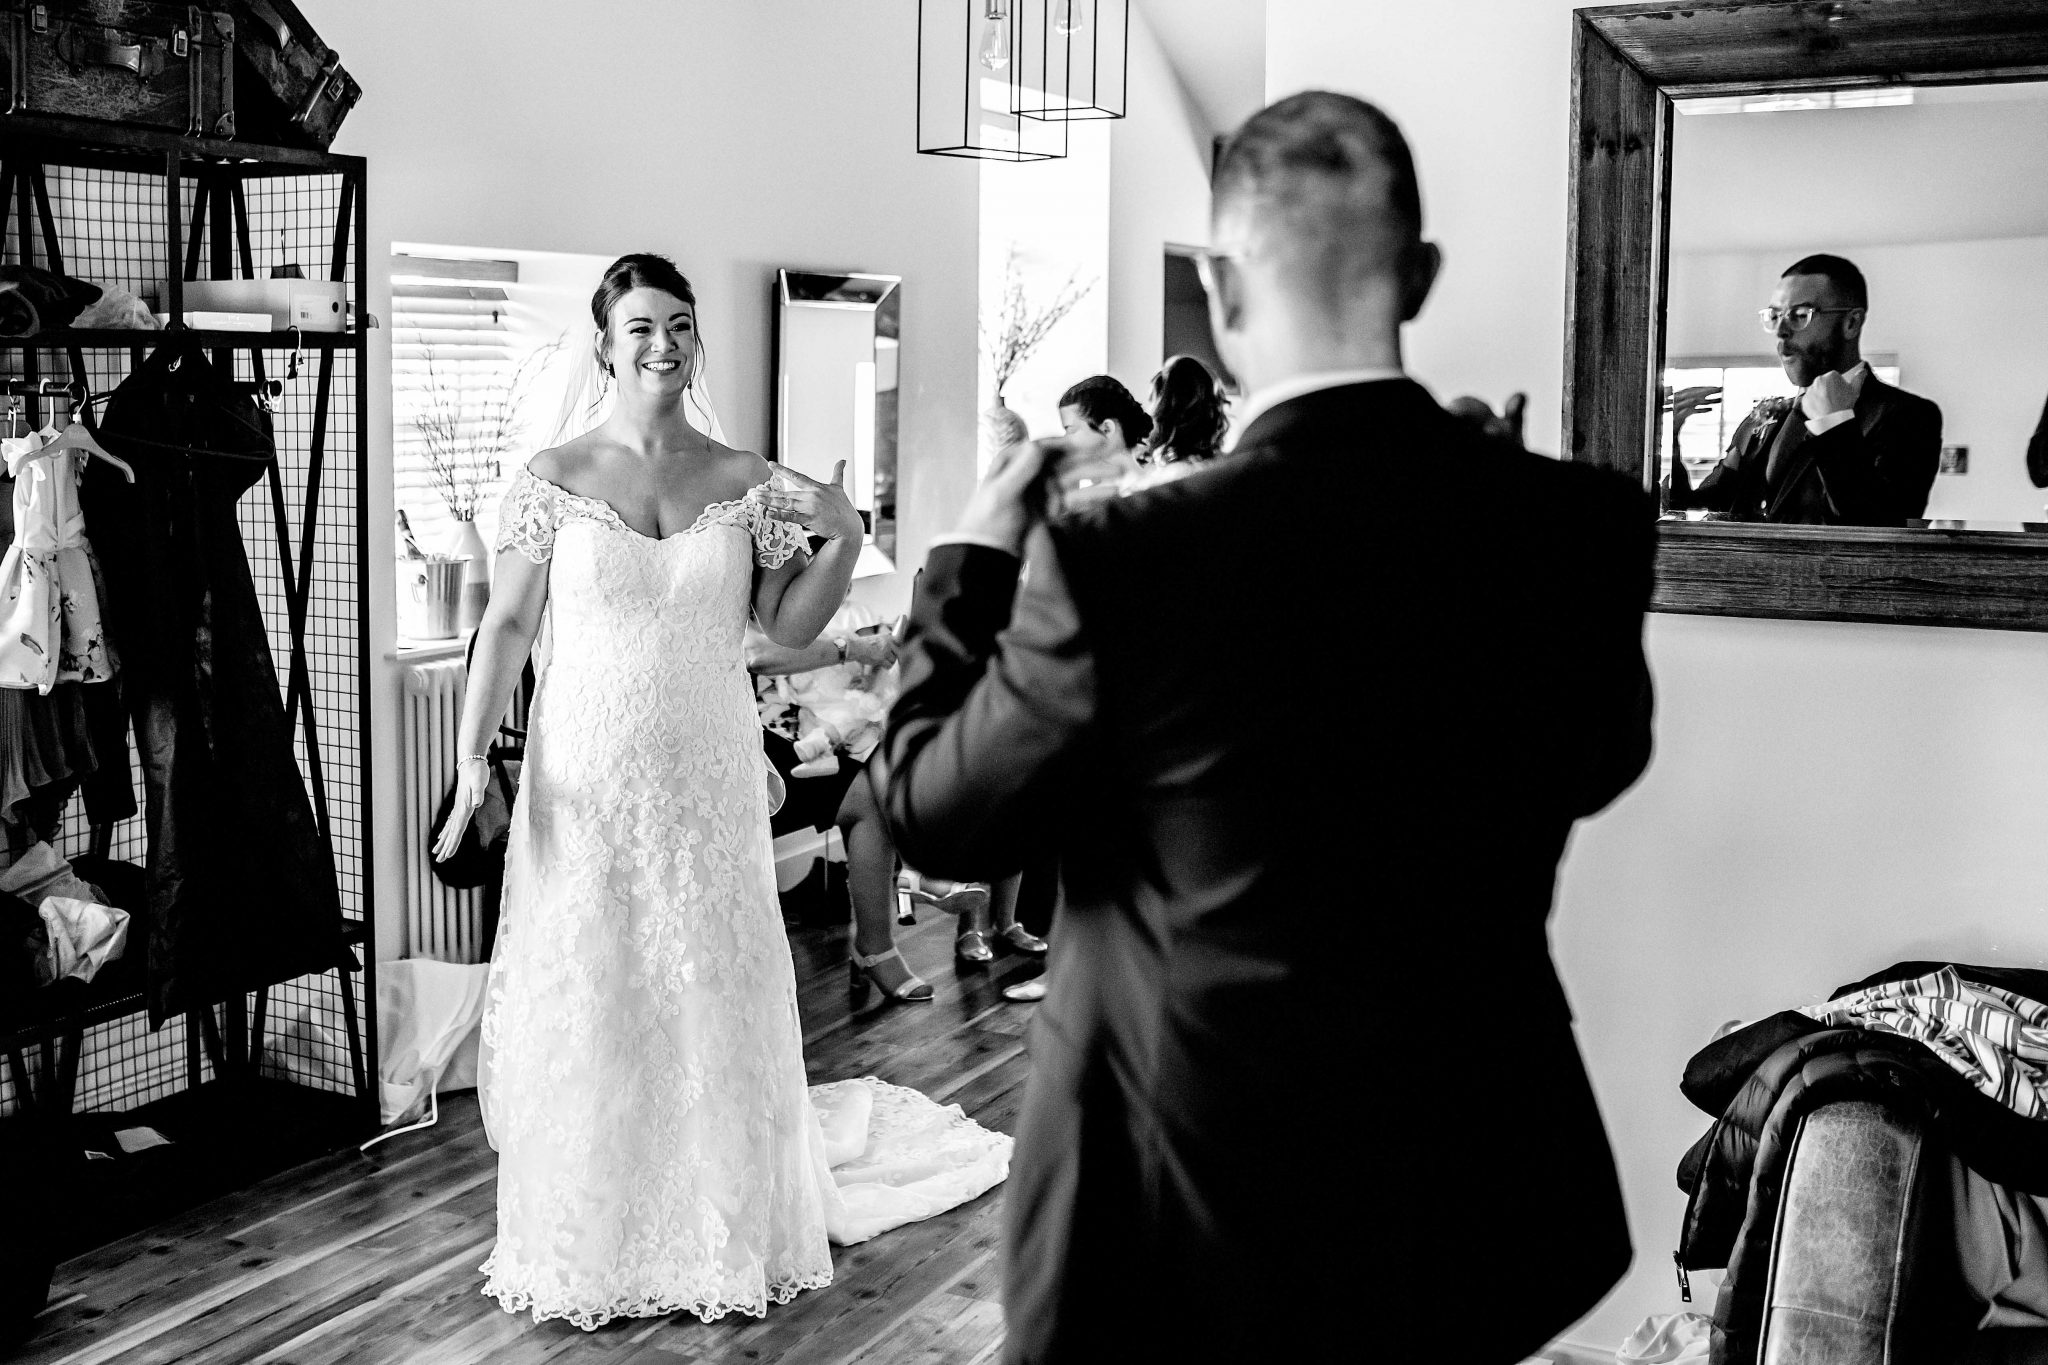 Liverpool Wedding Liverpool Wedding Photographer Ollie Gyte Photography